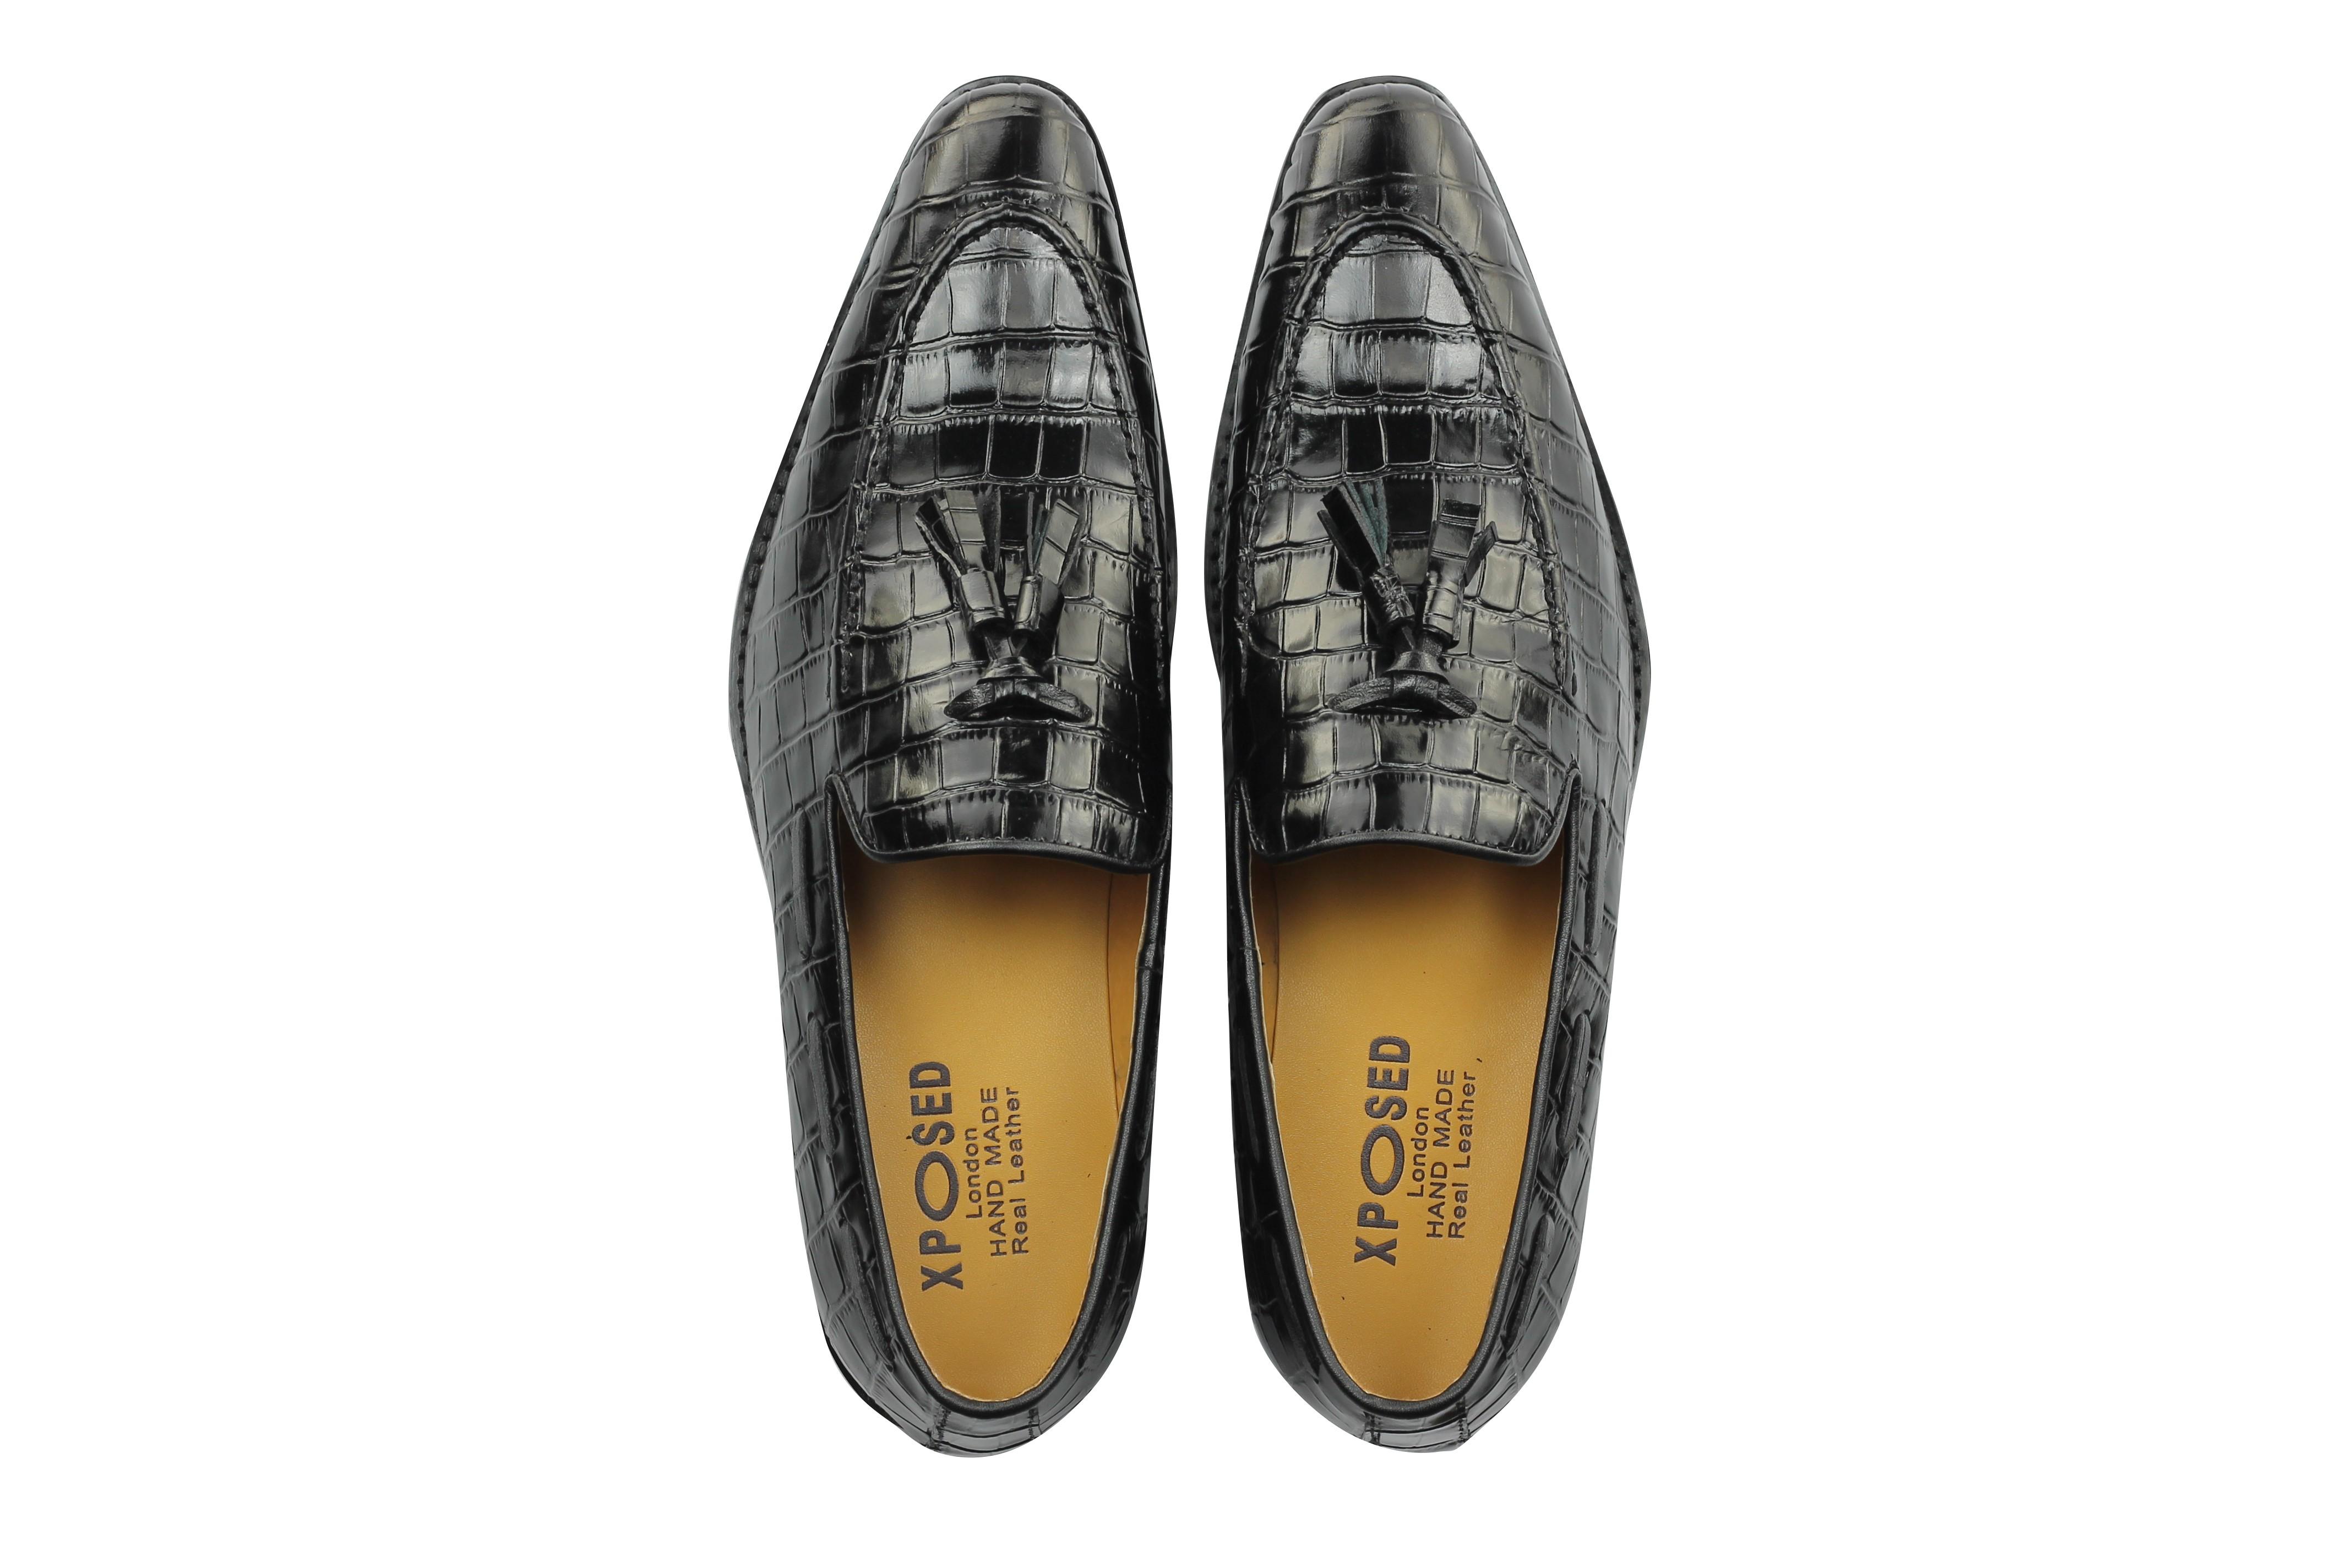 f3092af8d1a5a3 Mens Crocodile Print Shiny Real Leather Tassel Loafers Shoes Vintage ...